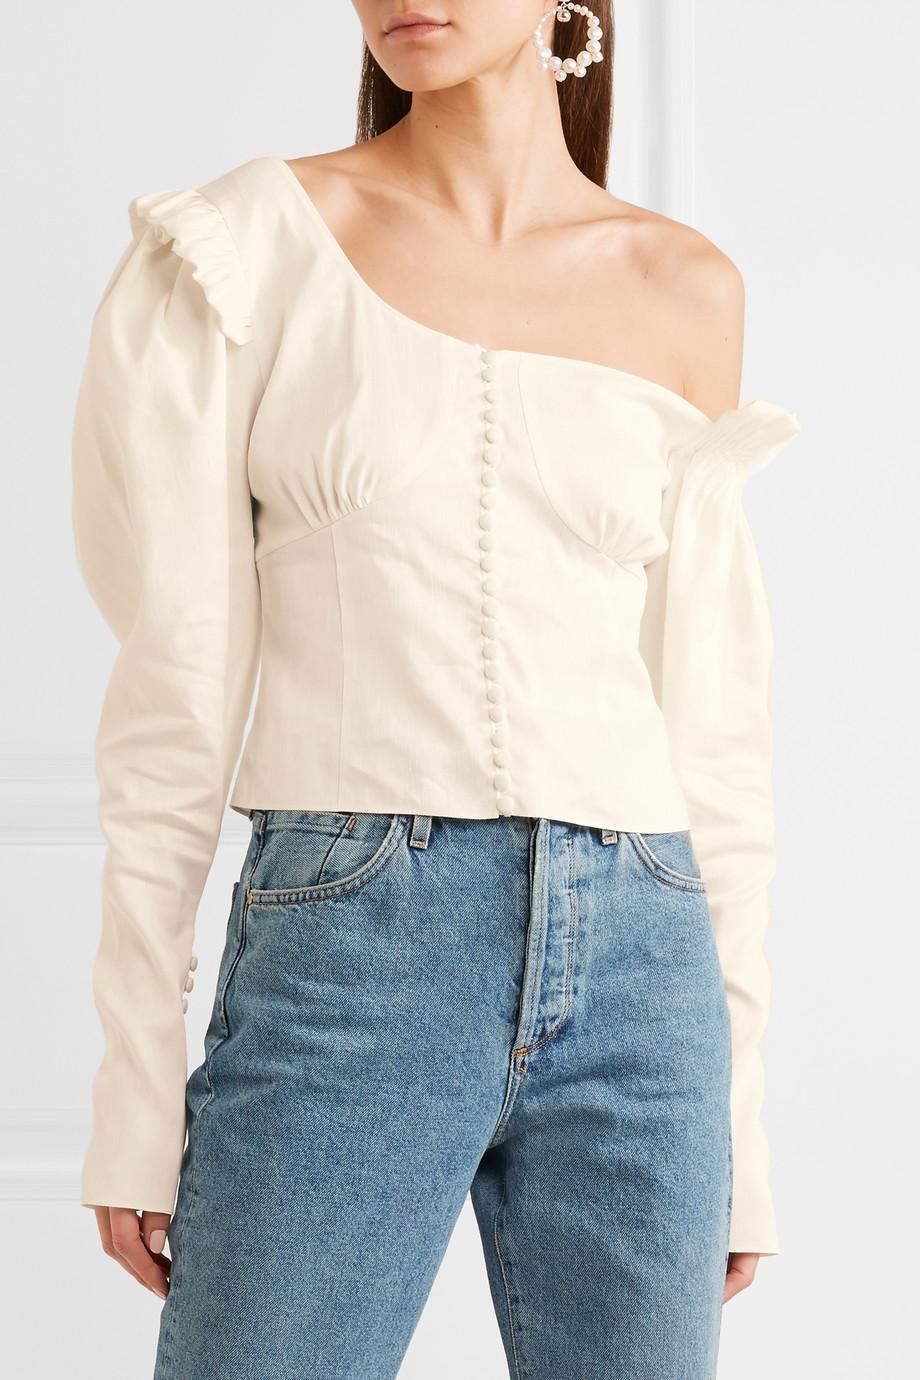 1de85be5f92 Magda Butrym Vannes Off-the-shoulder Ruffle-trimmed Linen-blend Top ...